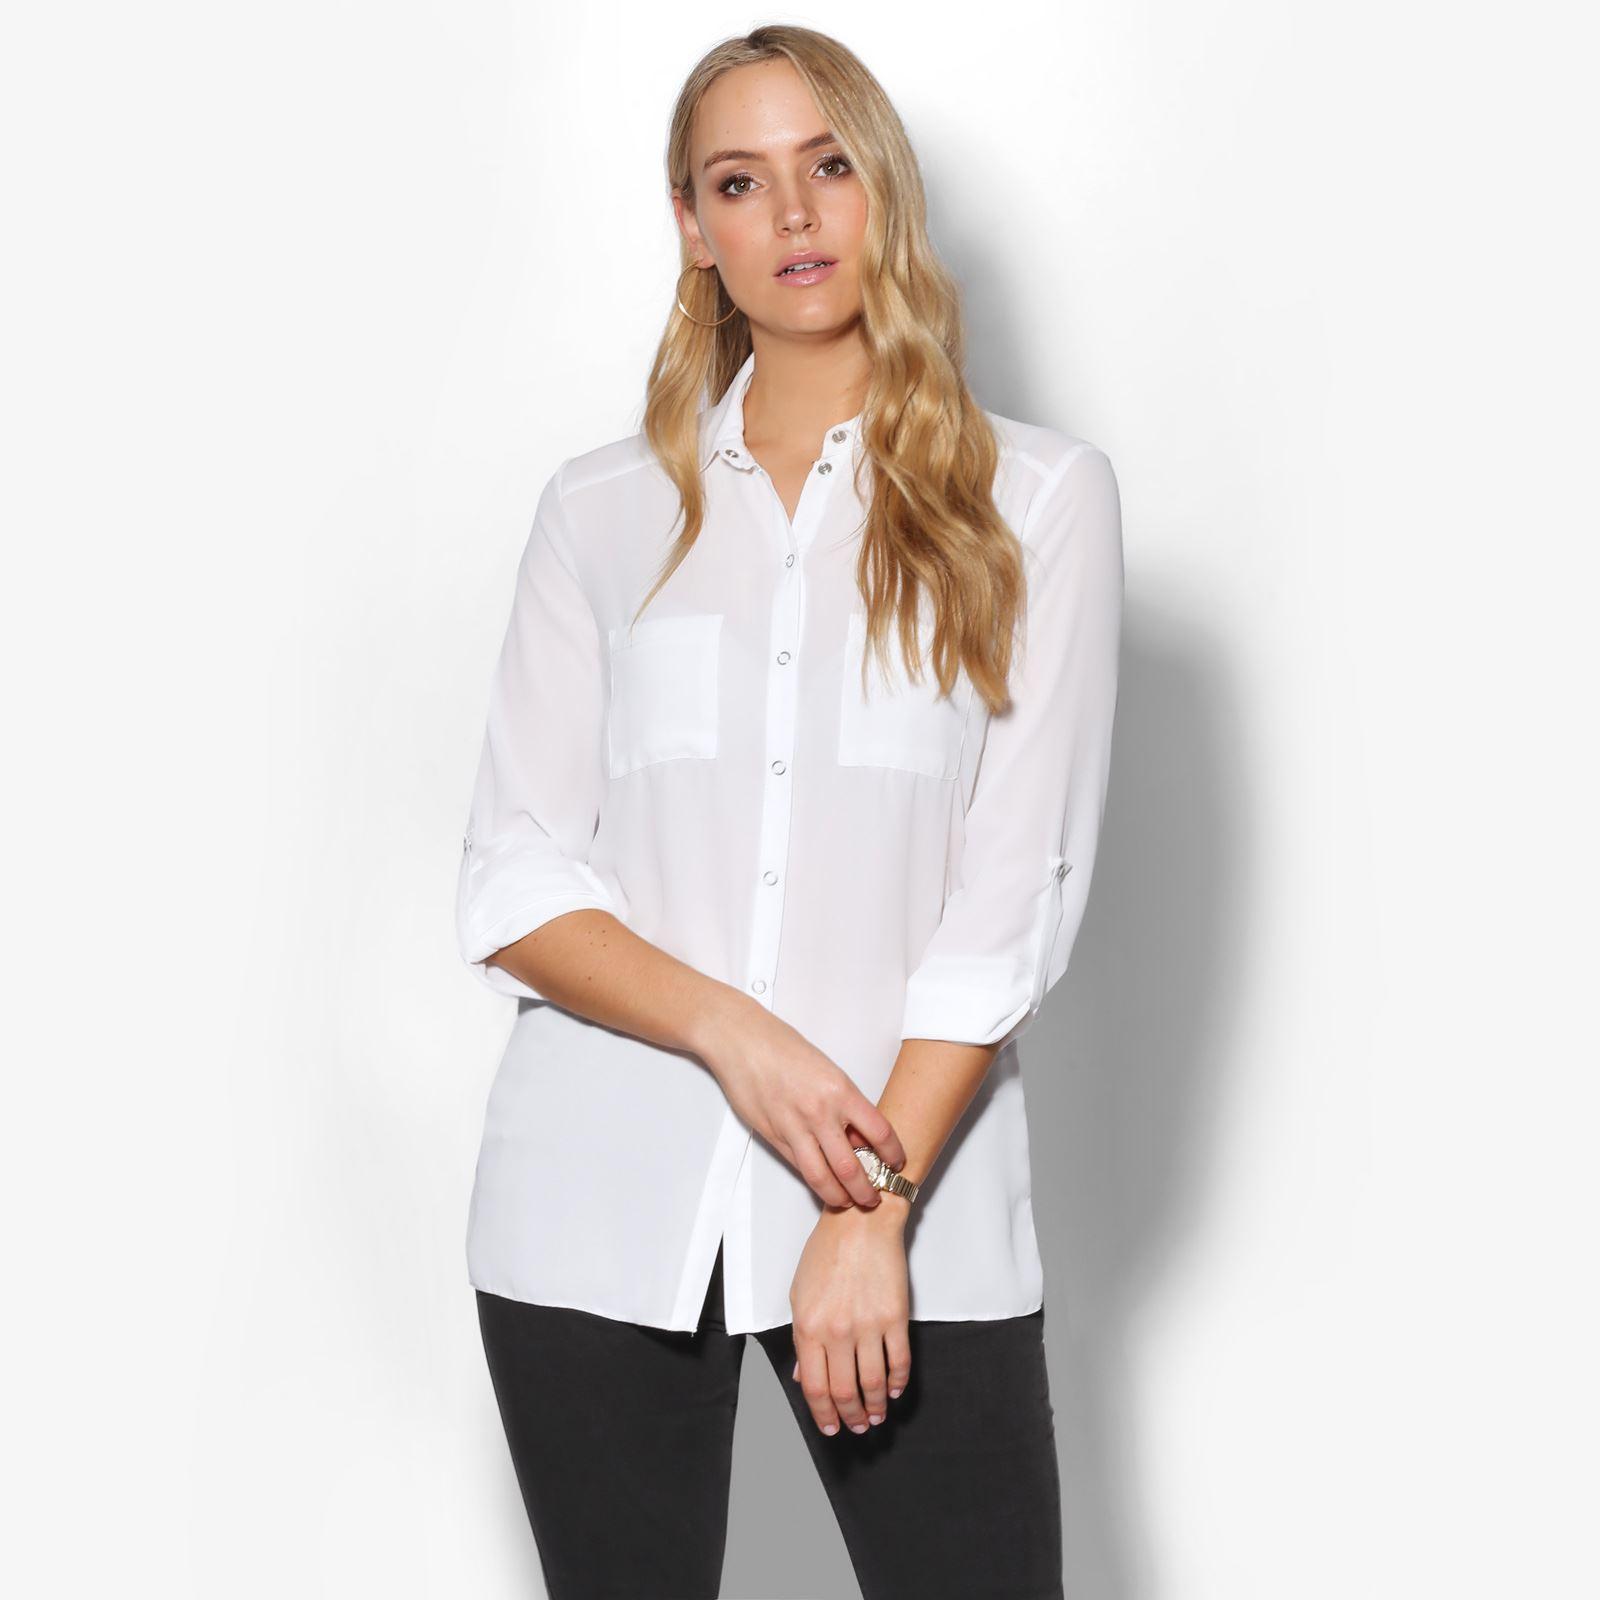 Women Oversized Long Sleeve Ladies Chiffon Shirt Blouse Top Work